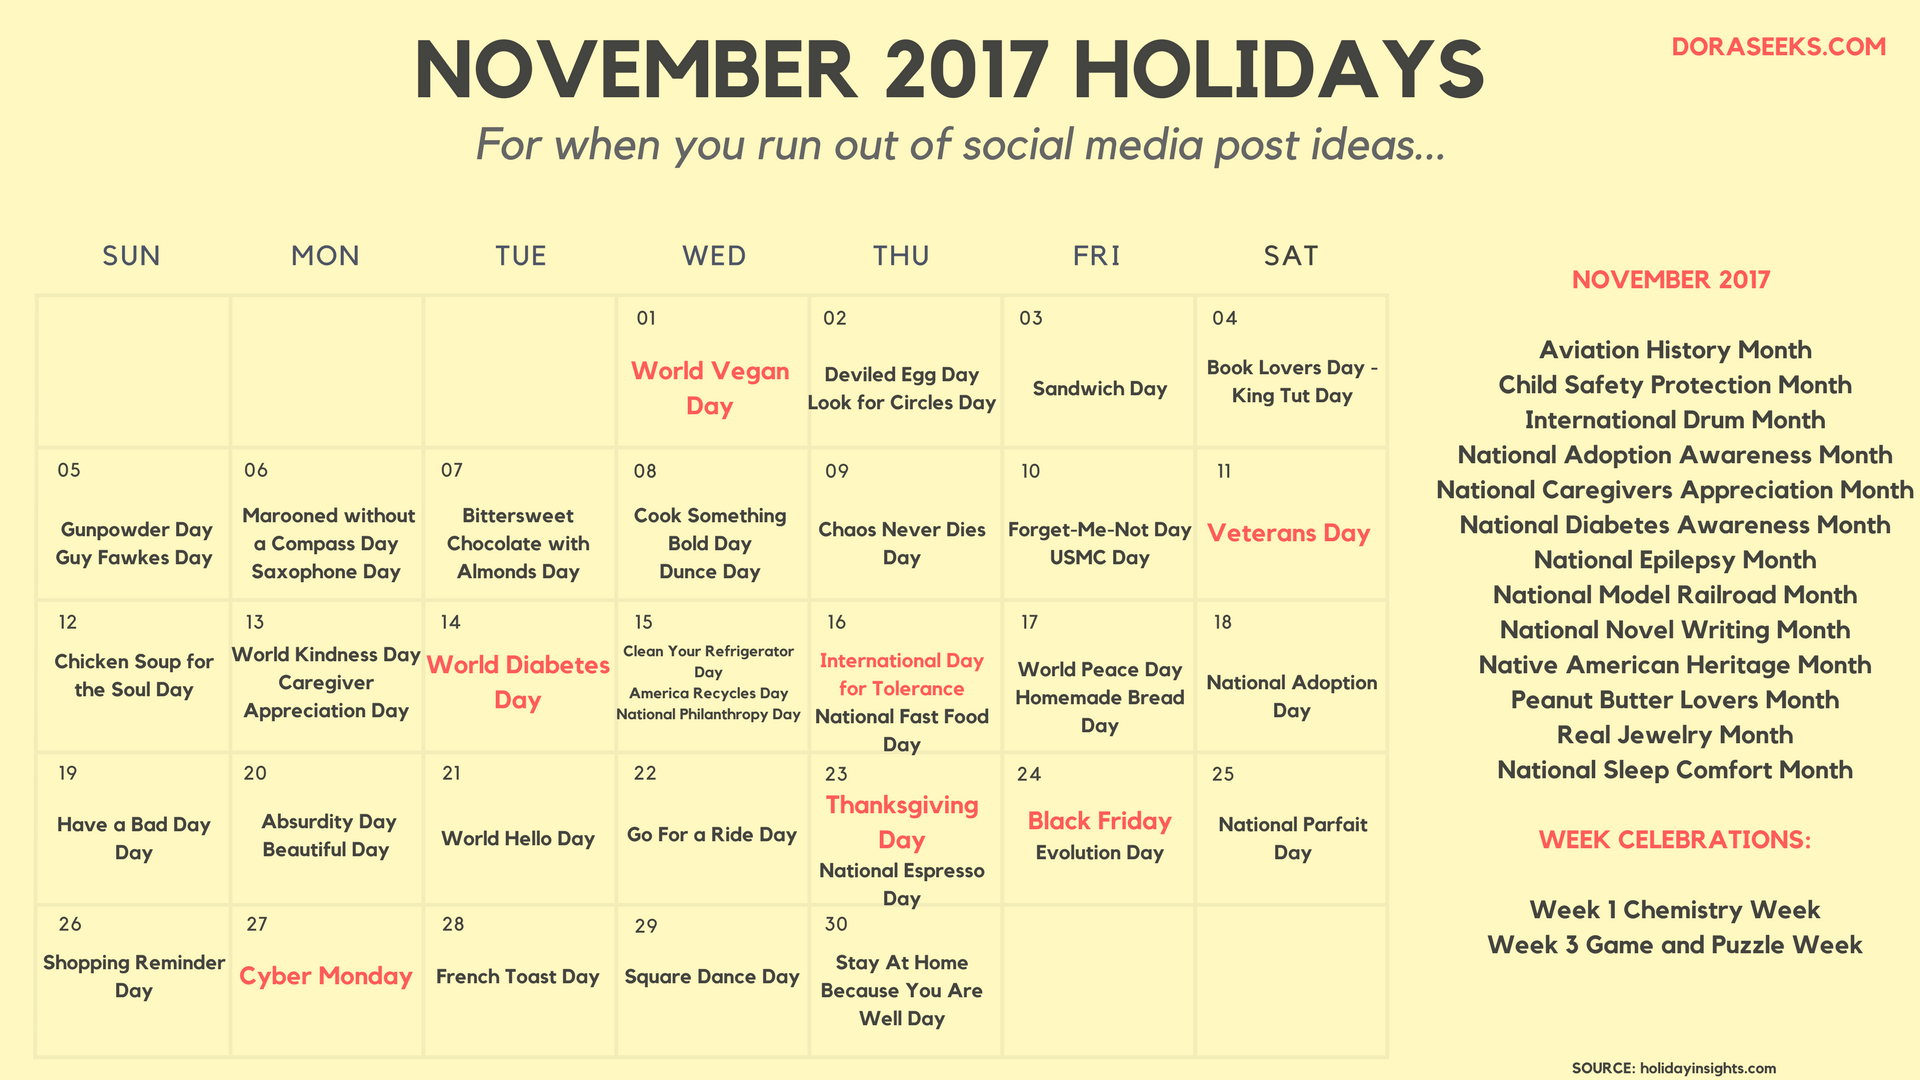 November 2017 Holiday Post Ideas Calendar